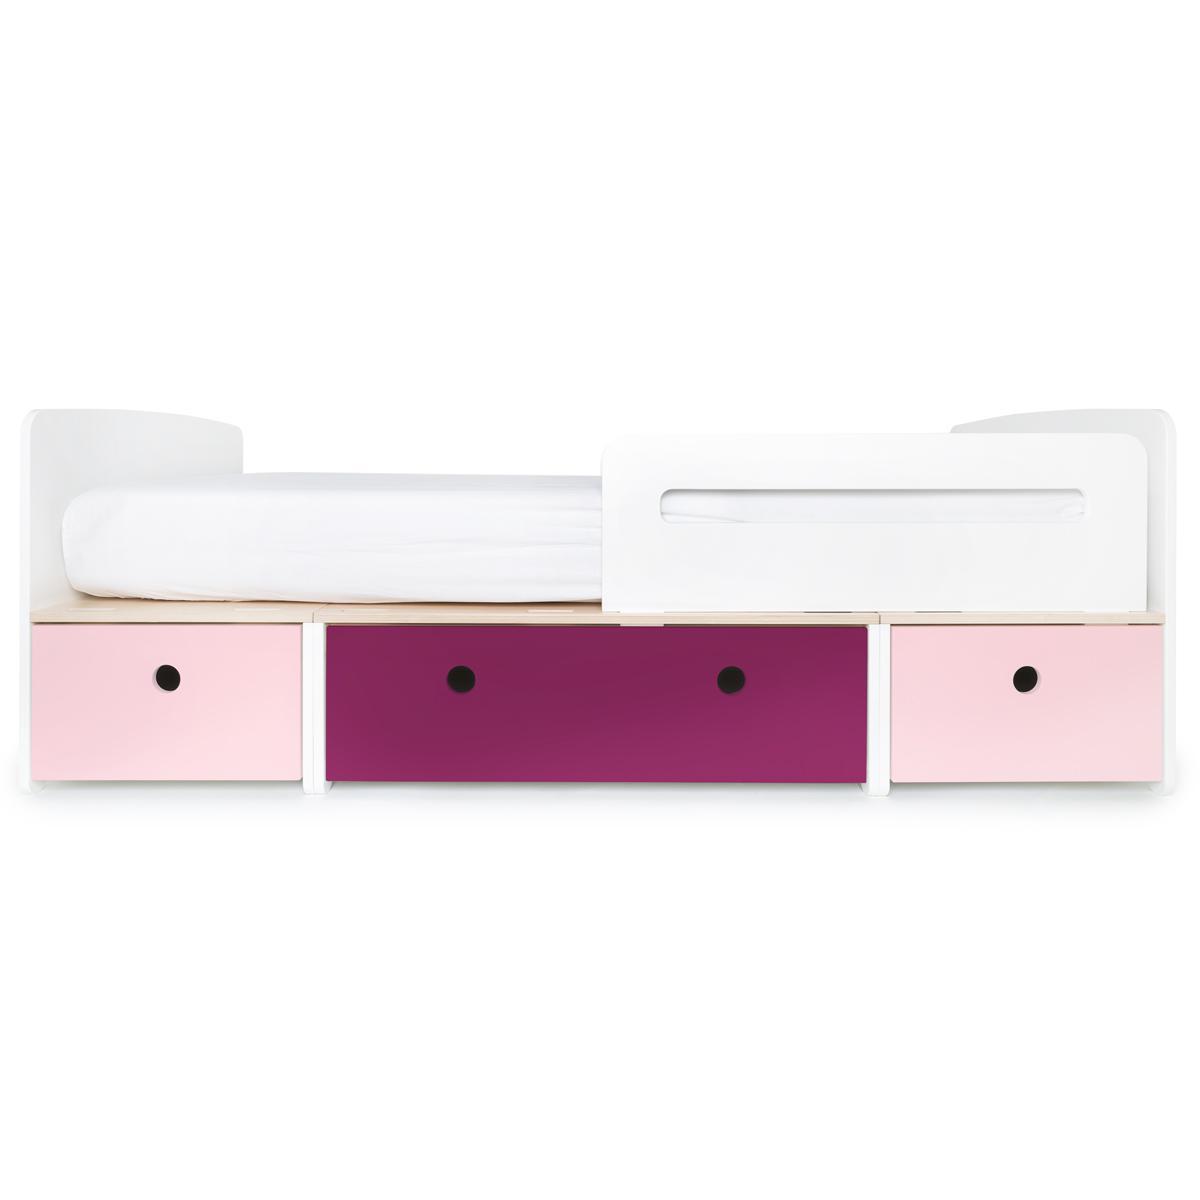 Kinderbett 90x200cm COLORFLEX sweet pink-plum-sweet pink